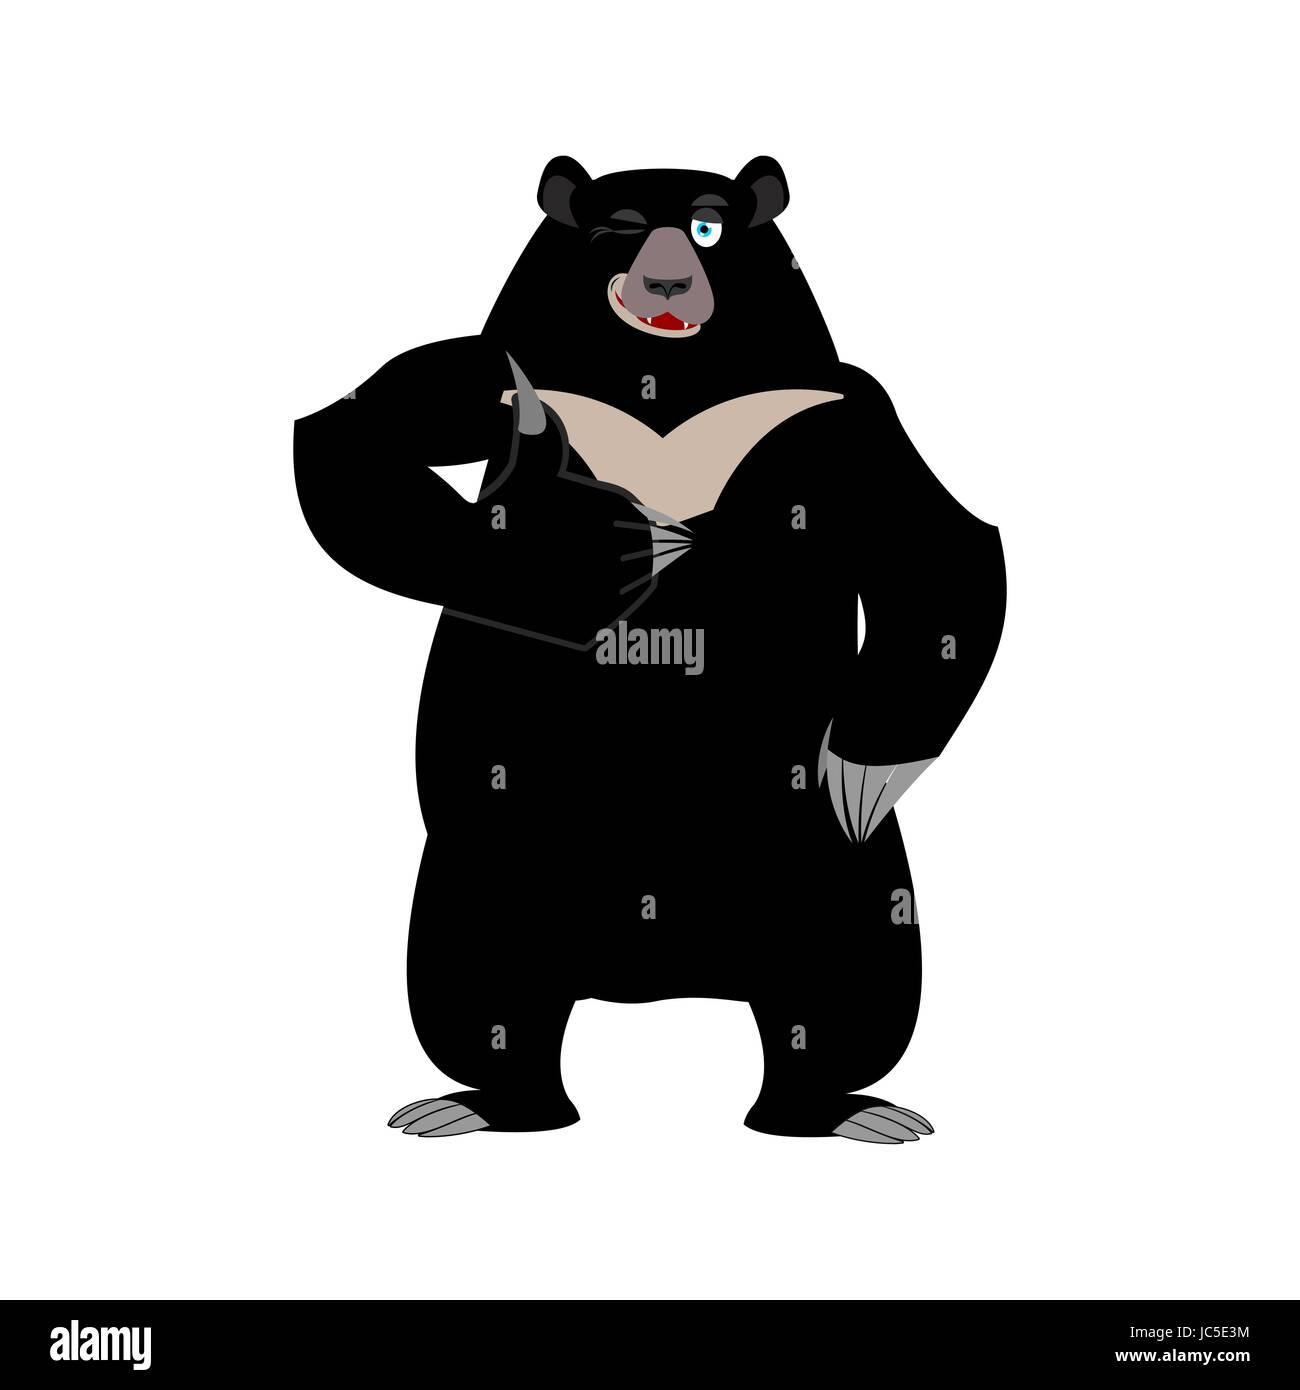 Himalayan bear thumbs up and winks. Cheerful wild animal emoji. Black big beast - Stock Vector